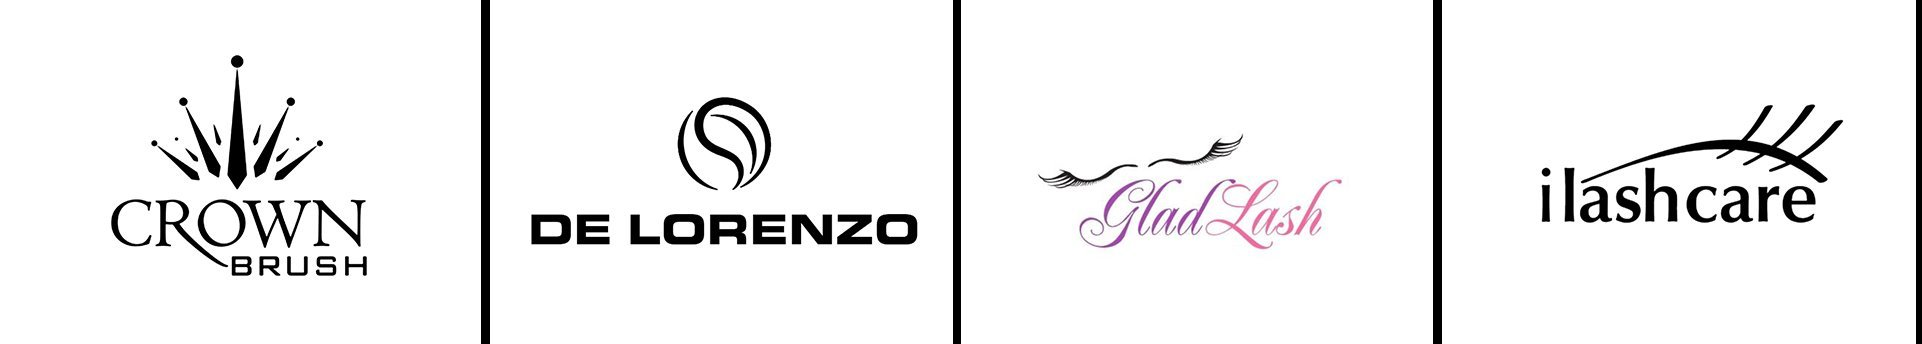 the makeup mirror crown brushes logo delorenzo logo glasd lash logo ilash care logo